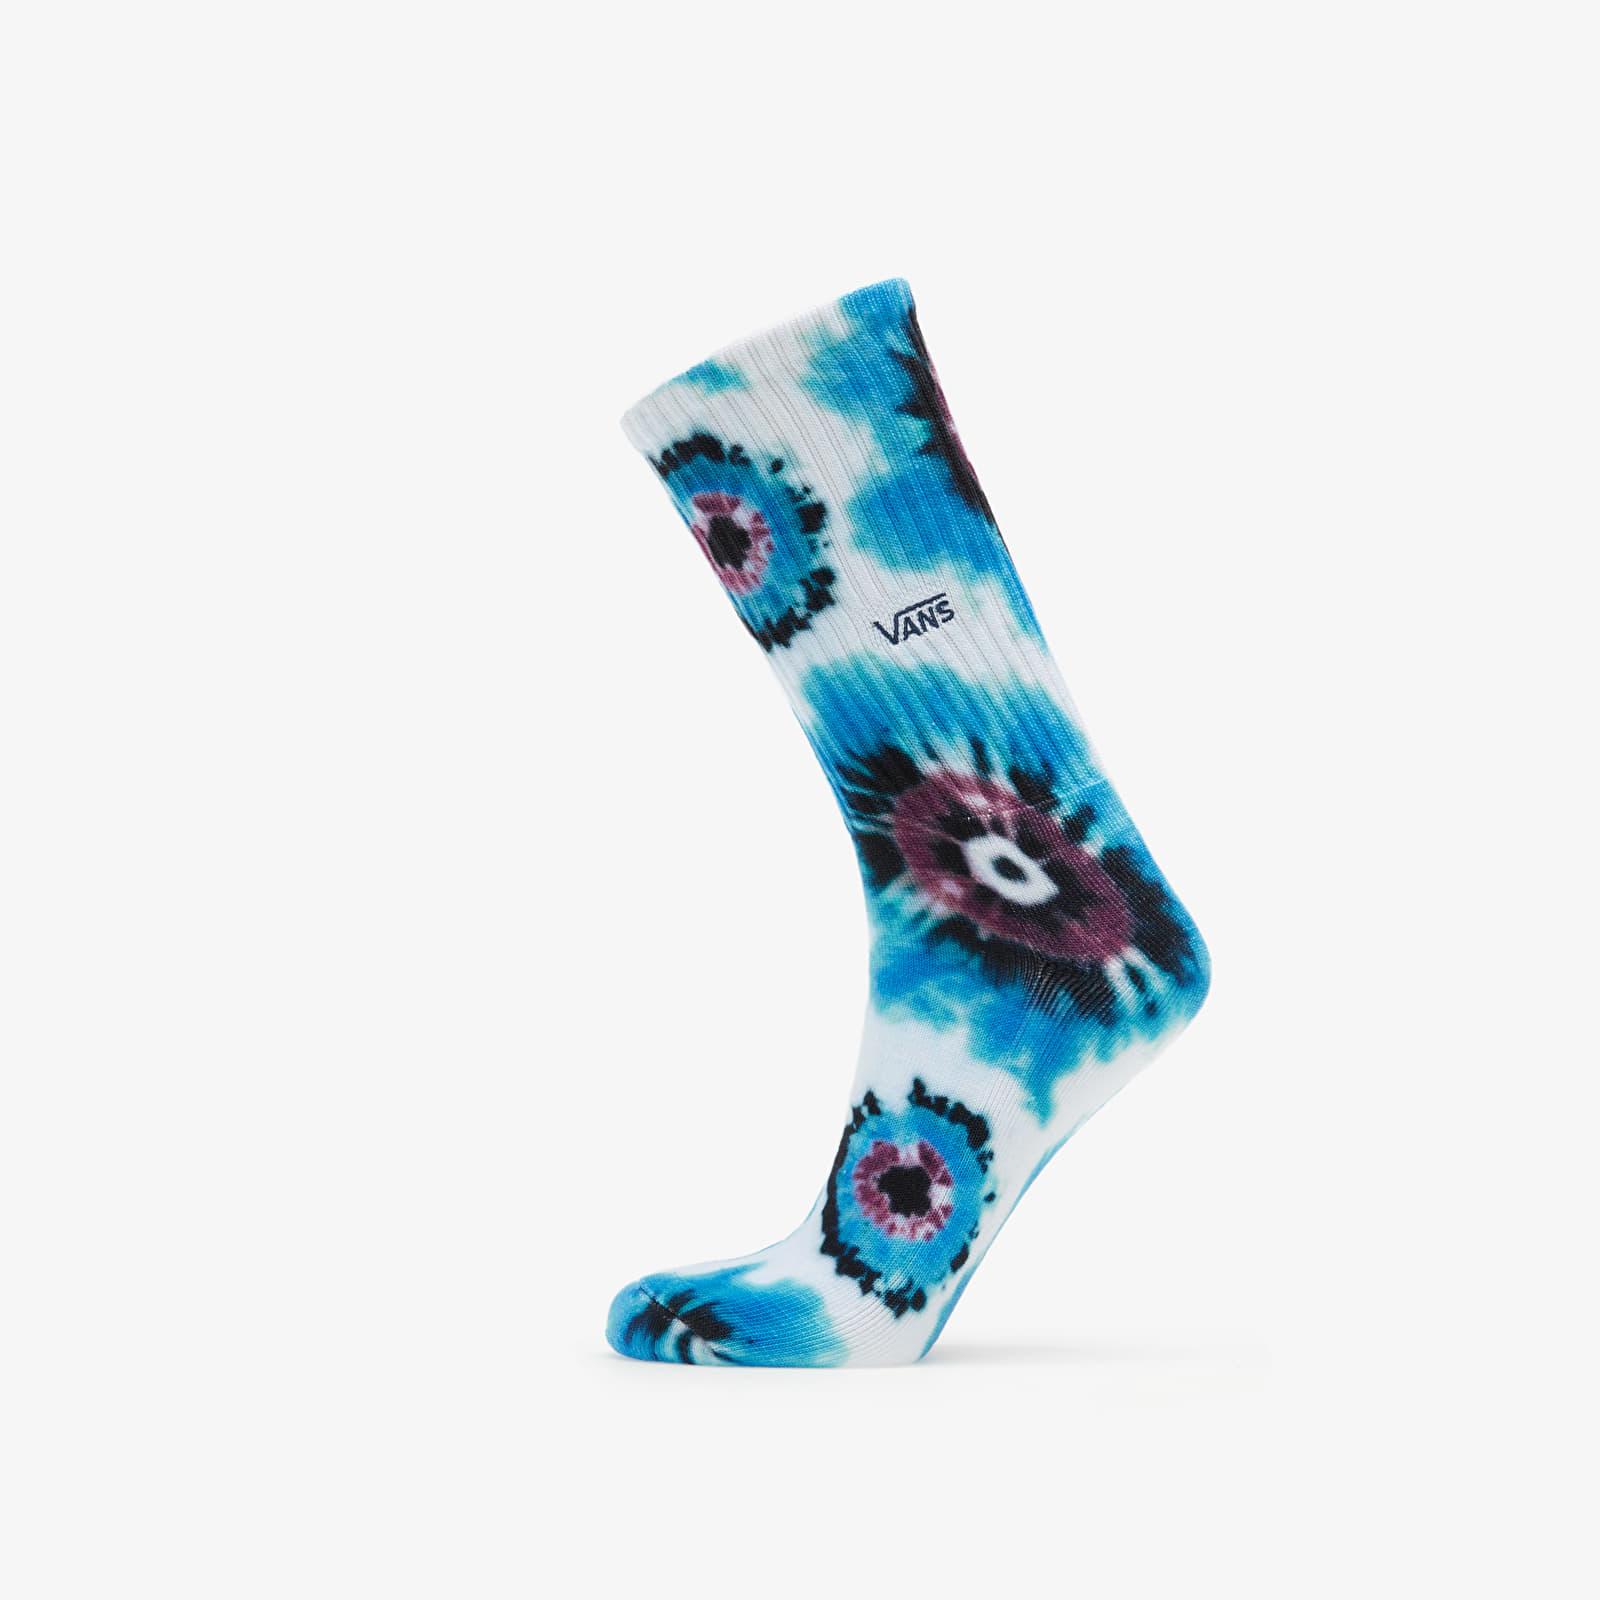 Socks Vans Socks Multicolor